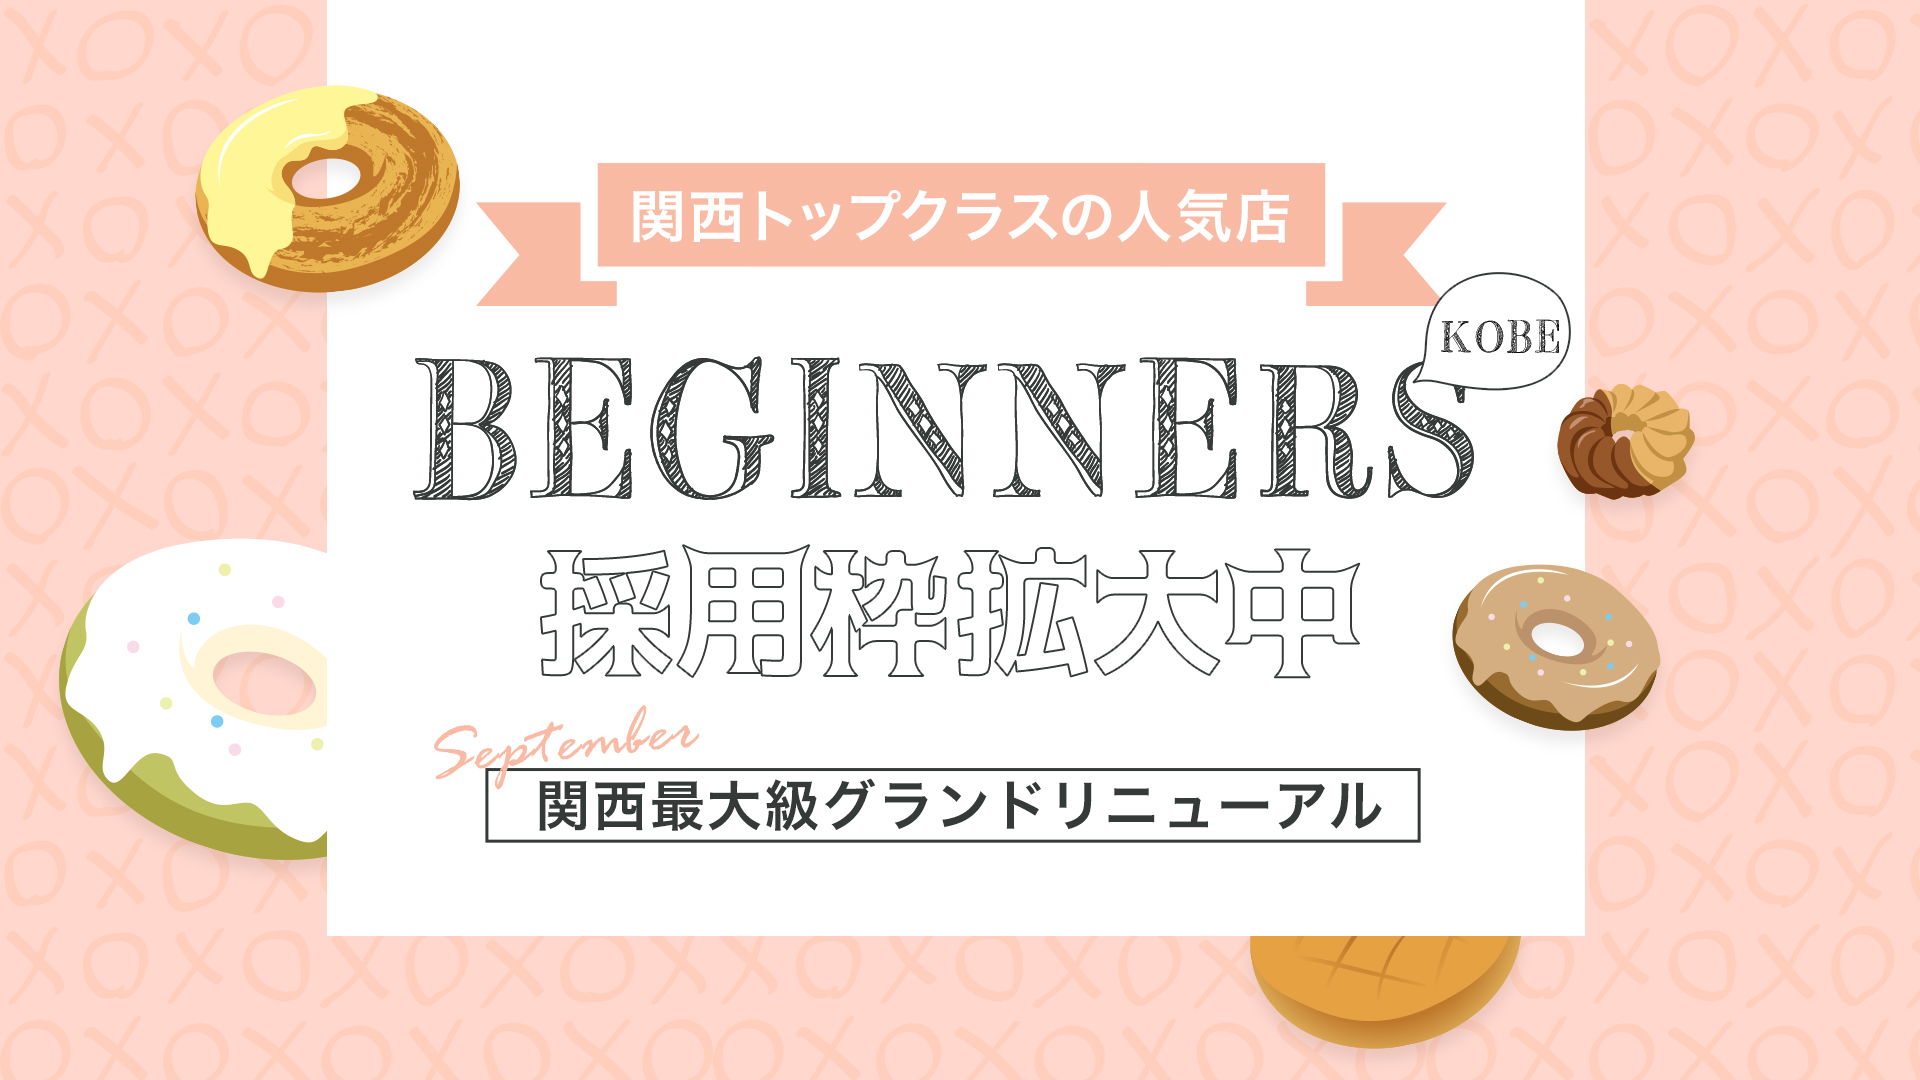 Beginners KOBE(ビギナーズ神戸)の求人画像